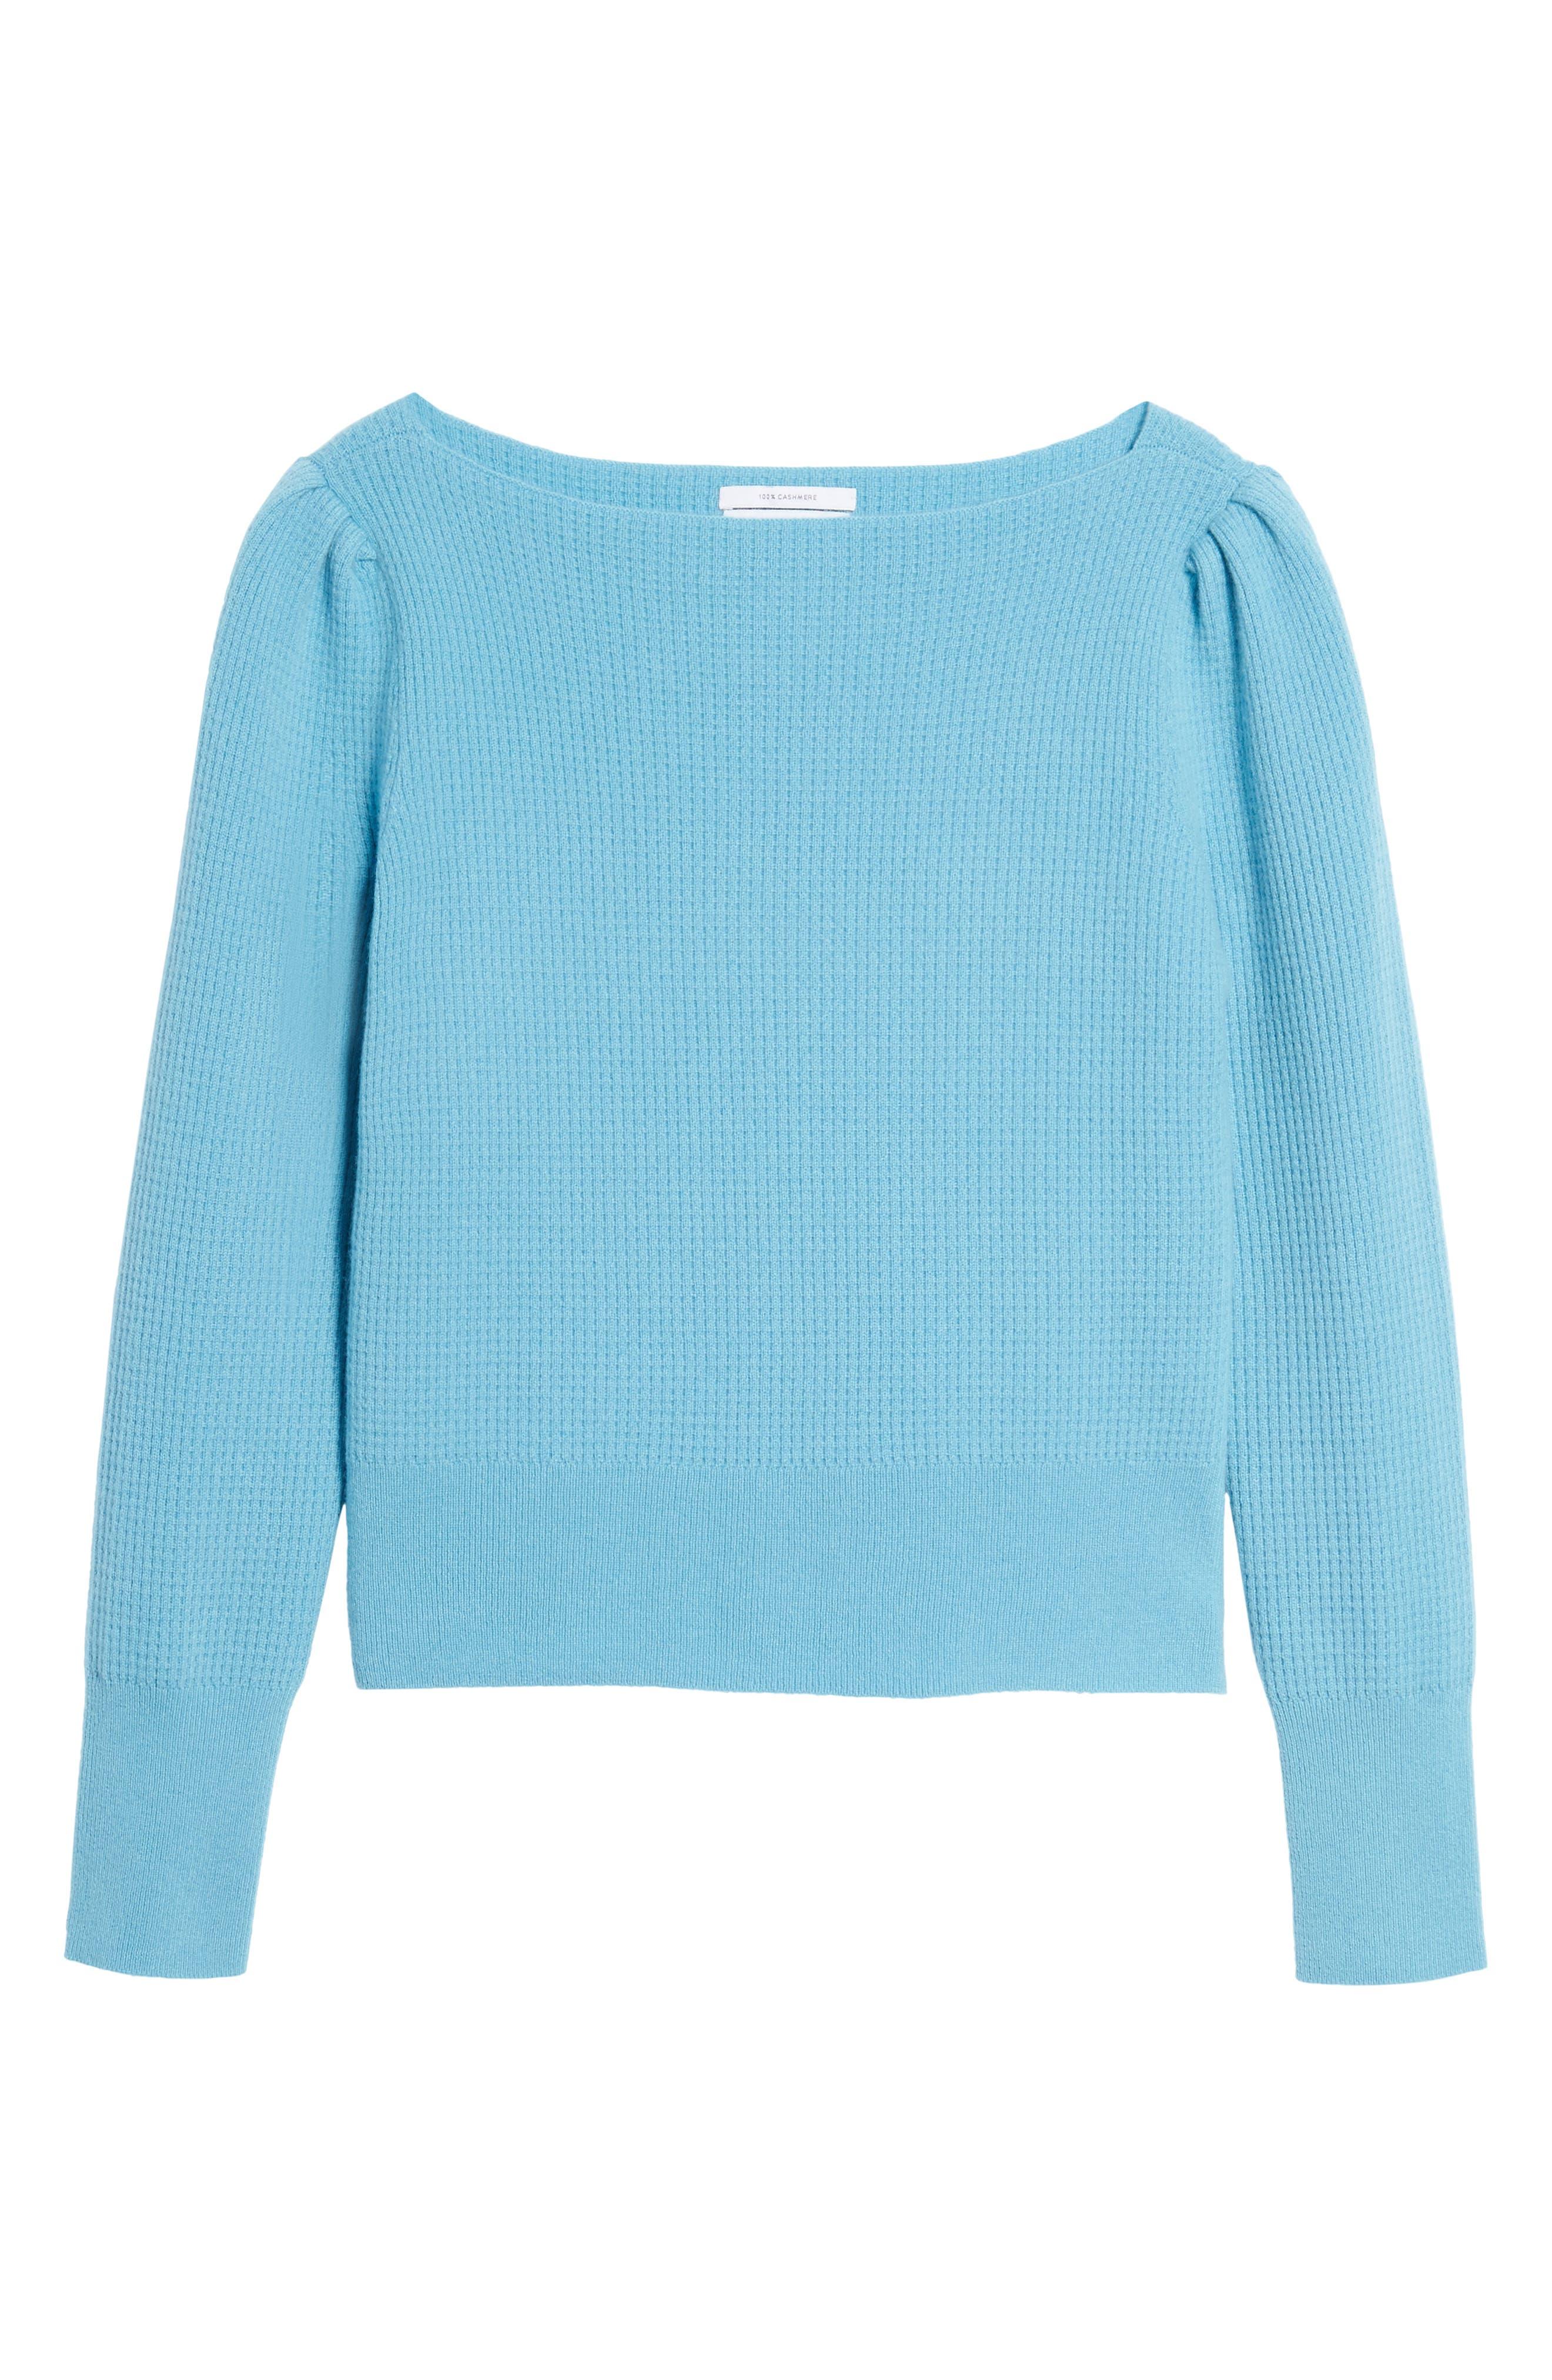 Waffle Stitch Cashmere Sweater,                             Alternate thumbnail 11, color,